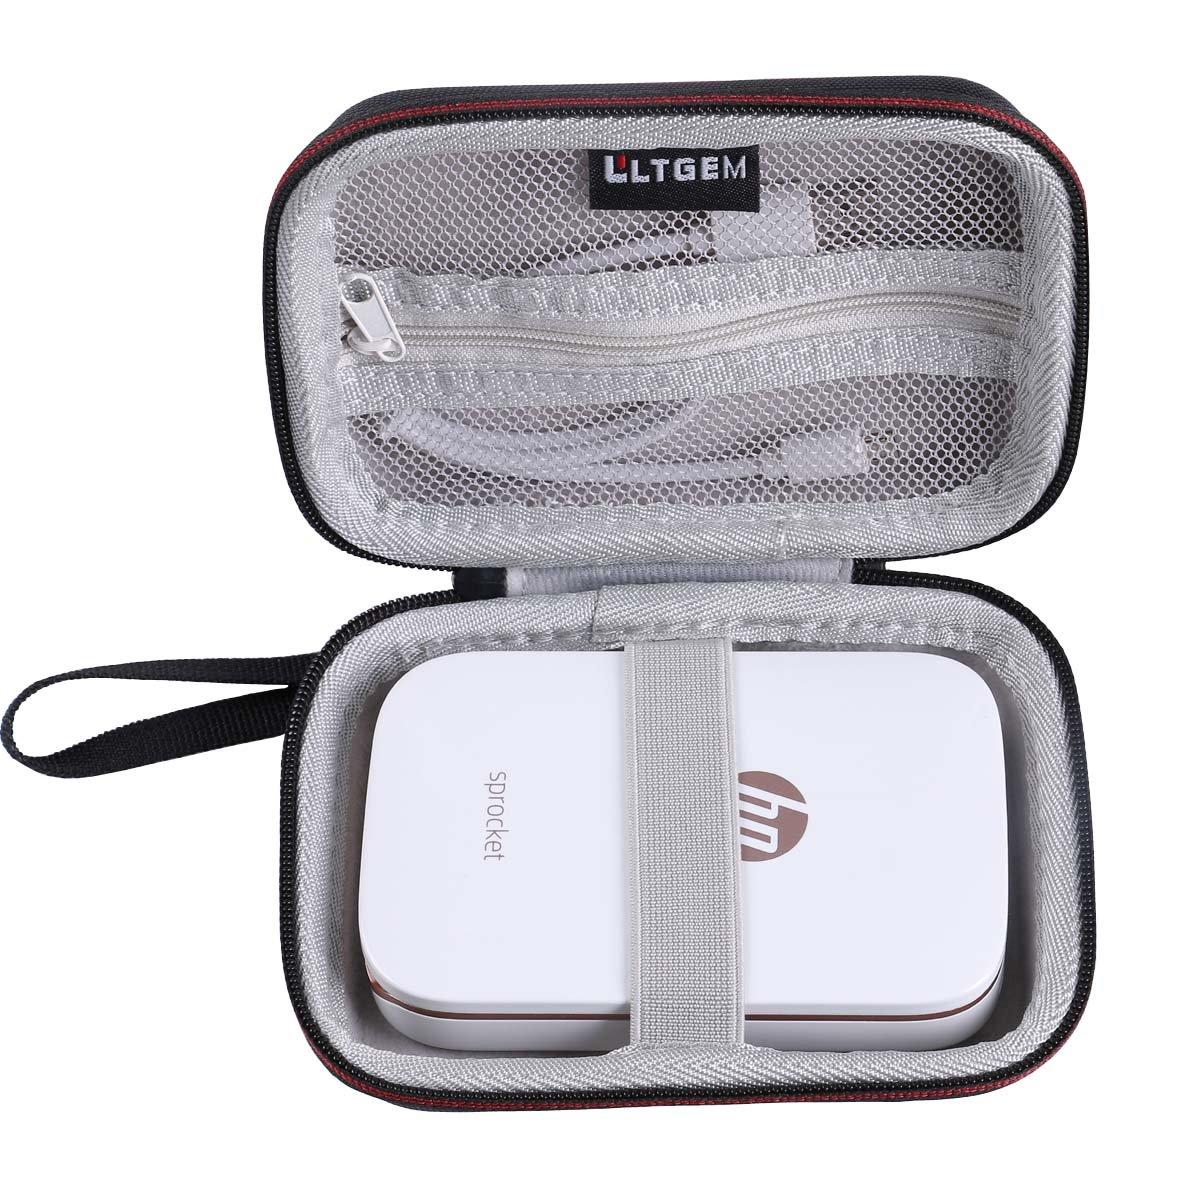 LTGEM EVA Custodia rigida Tasca da viaggio Case per HP Sprocket Stampante Fotografica Portatile CS090